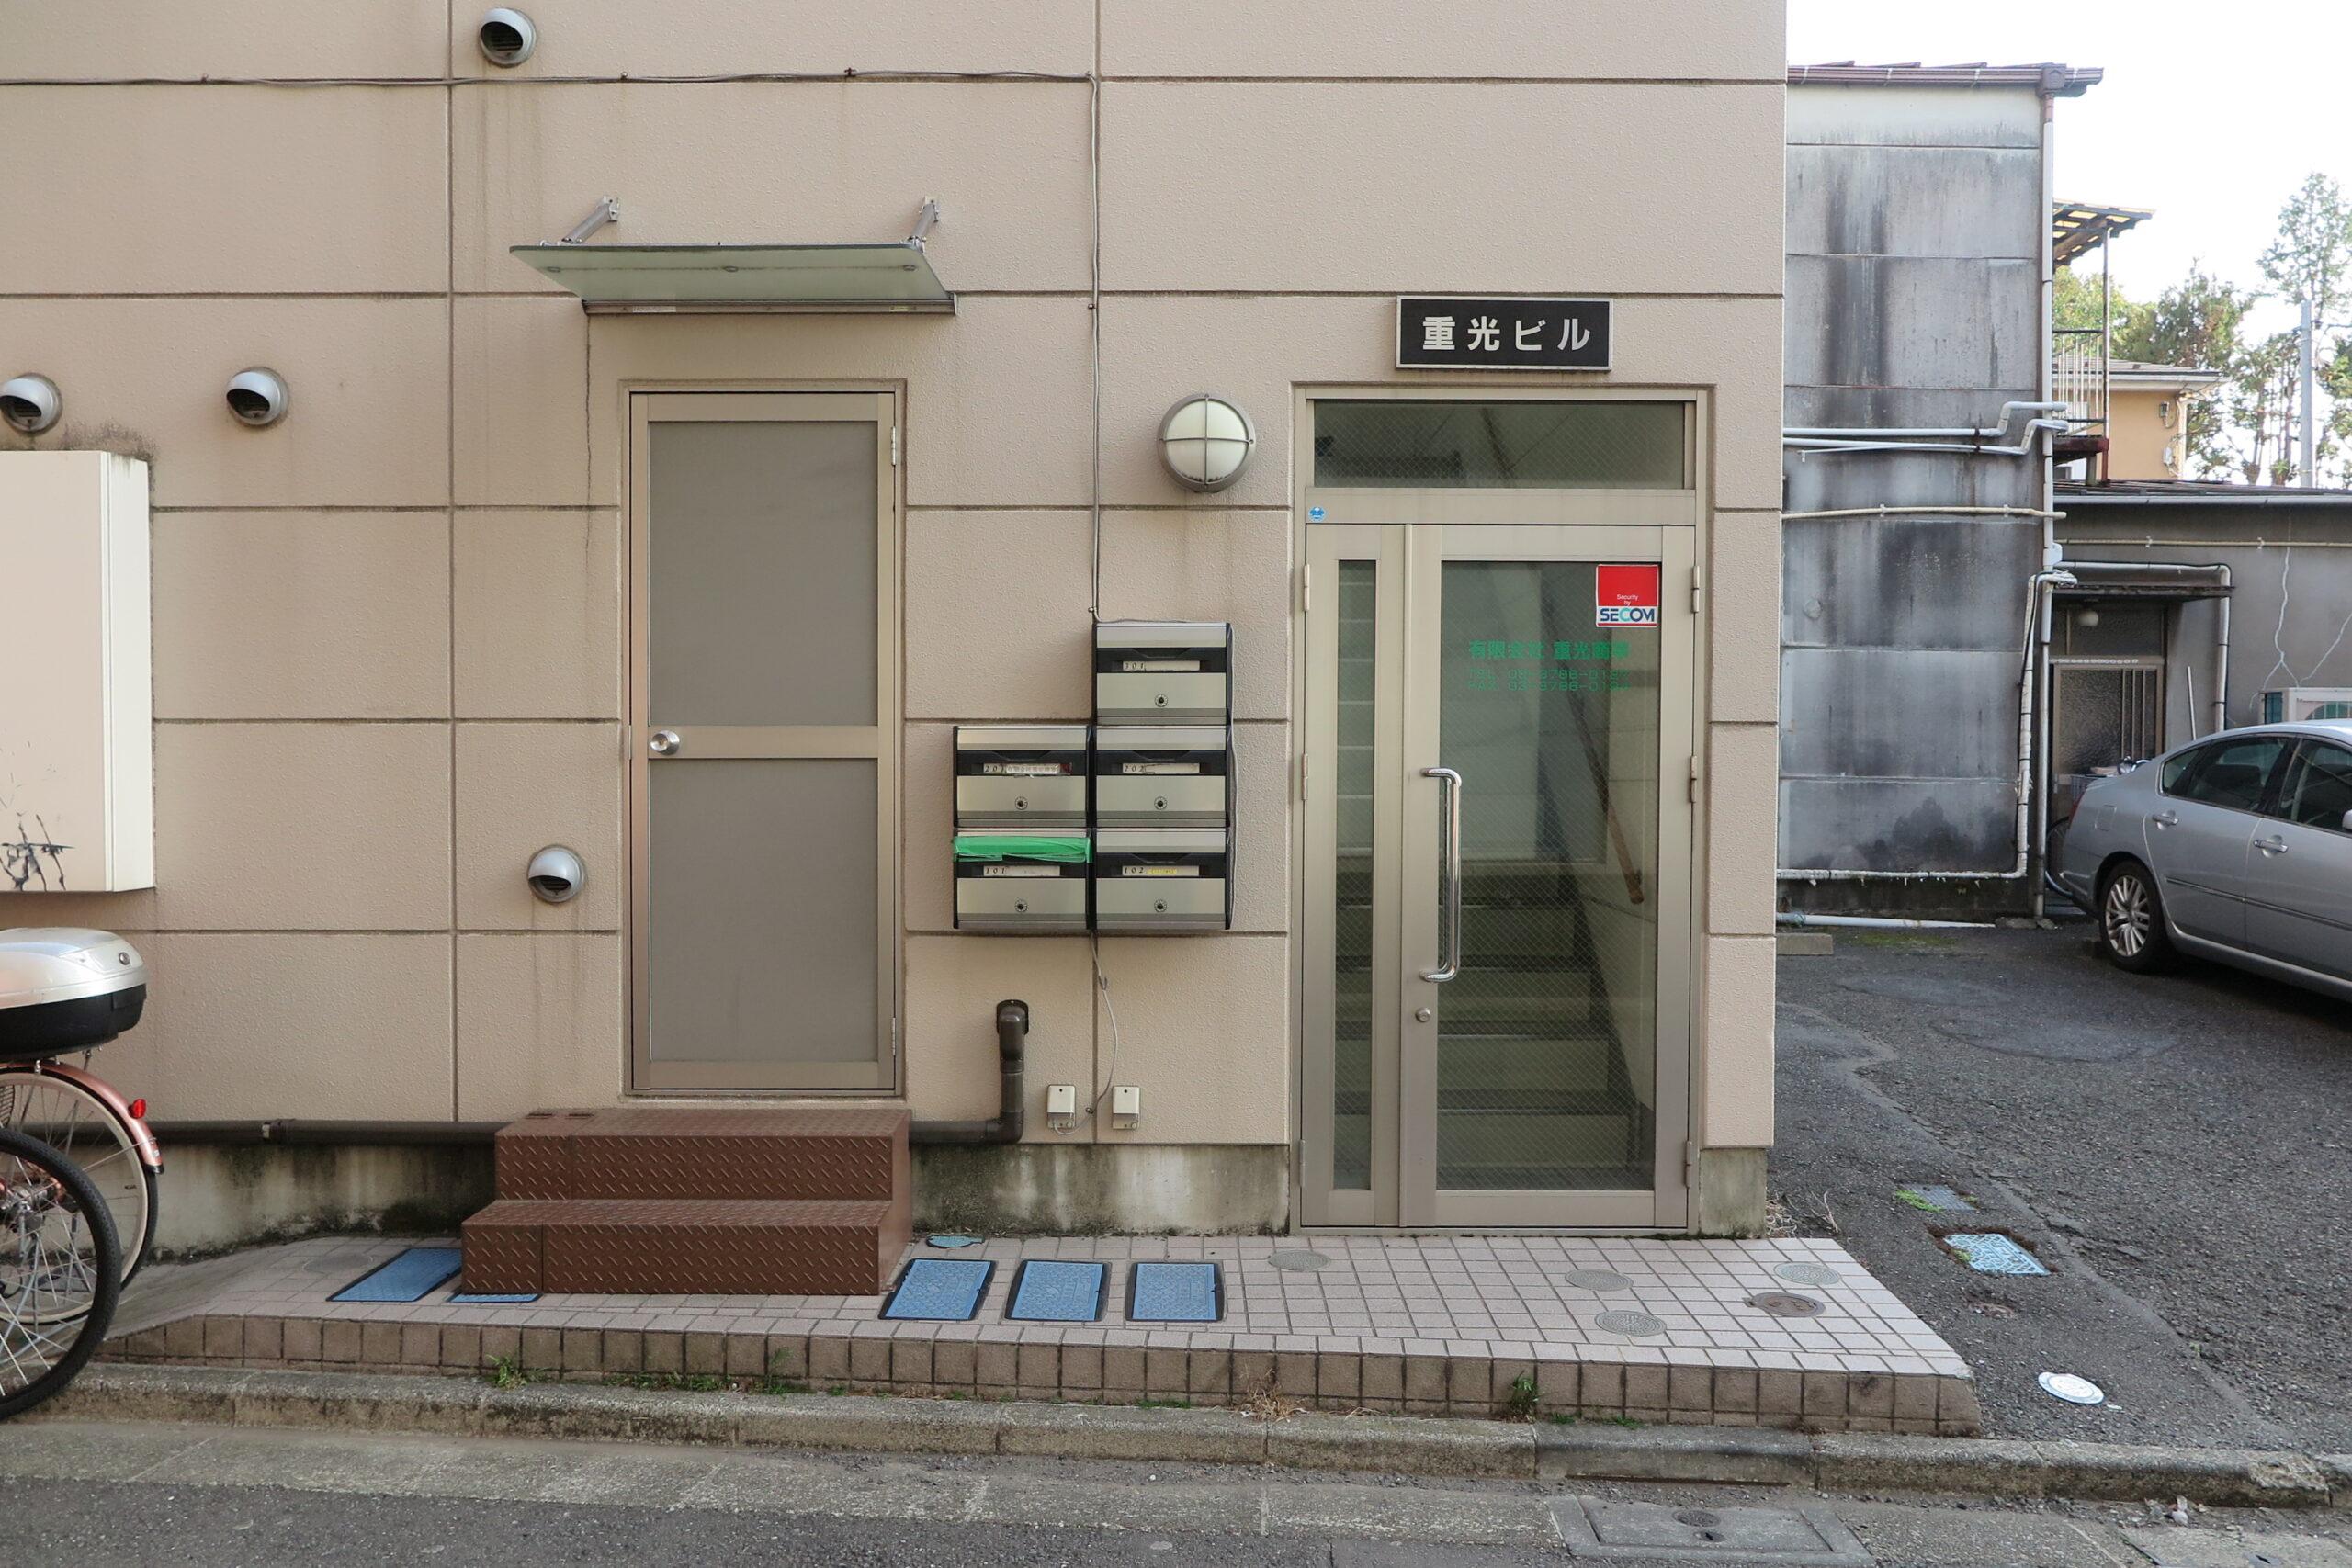 https://nakanobu.com/wp-content/uploads/2021/04/426accd0813b17be8c9d408425d1db17-scaled.jpg